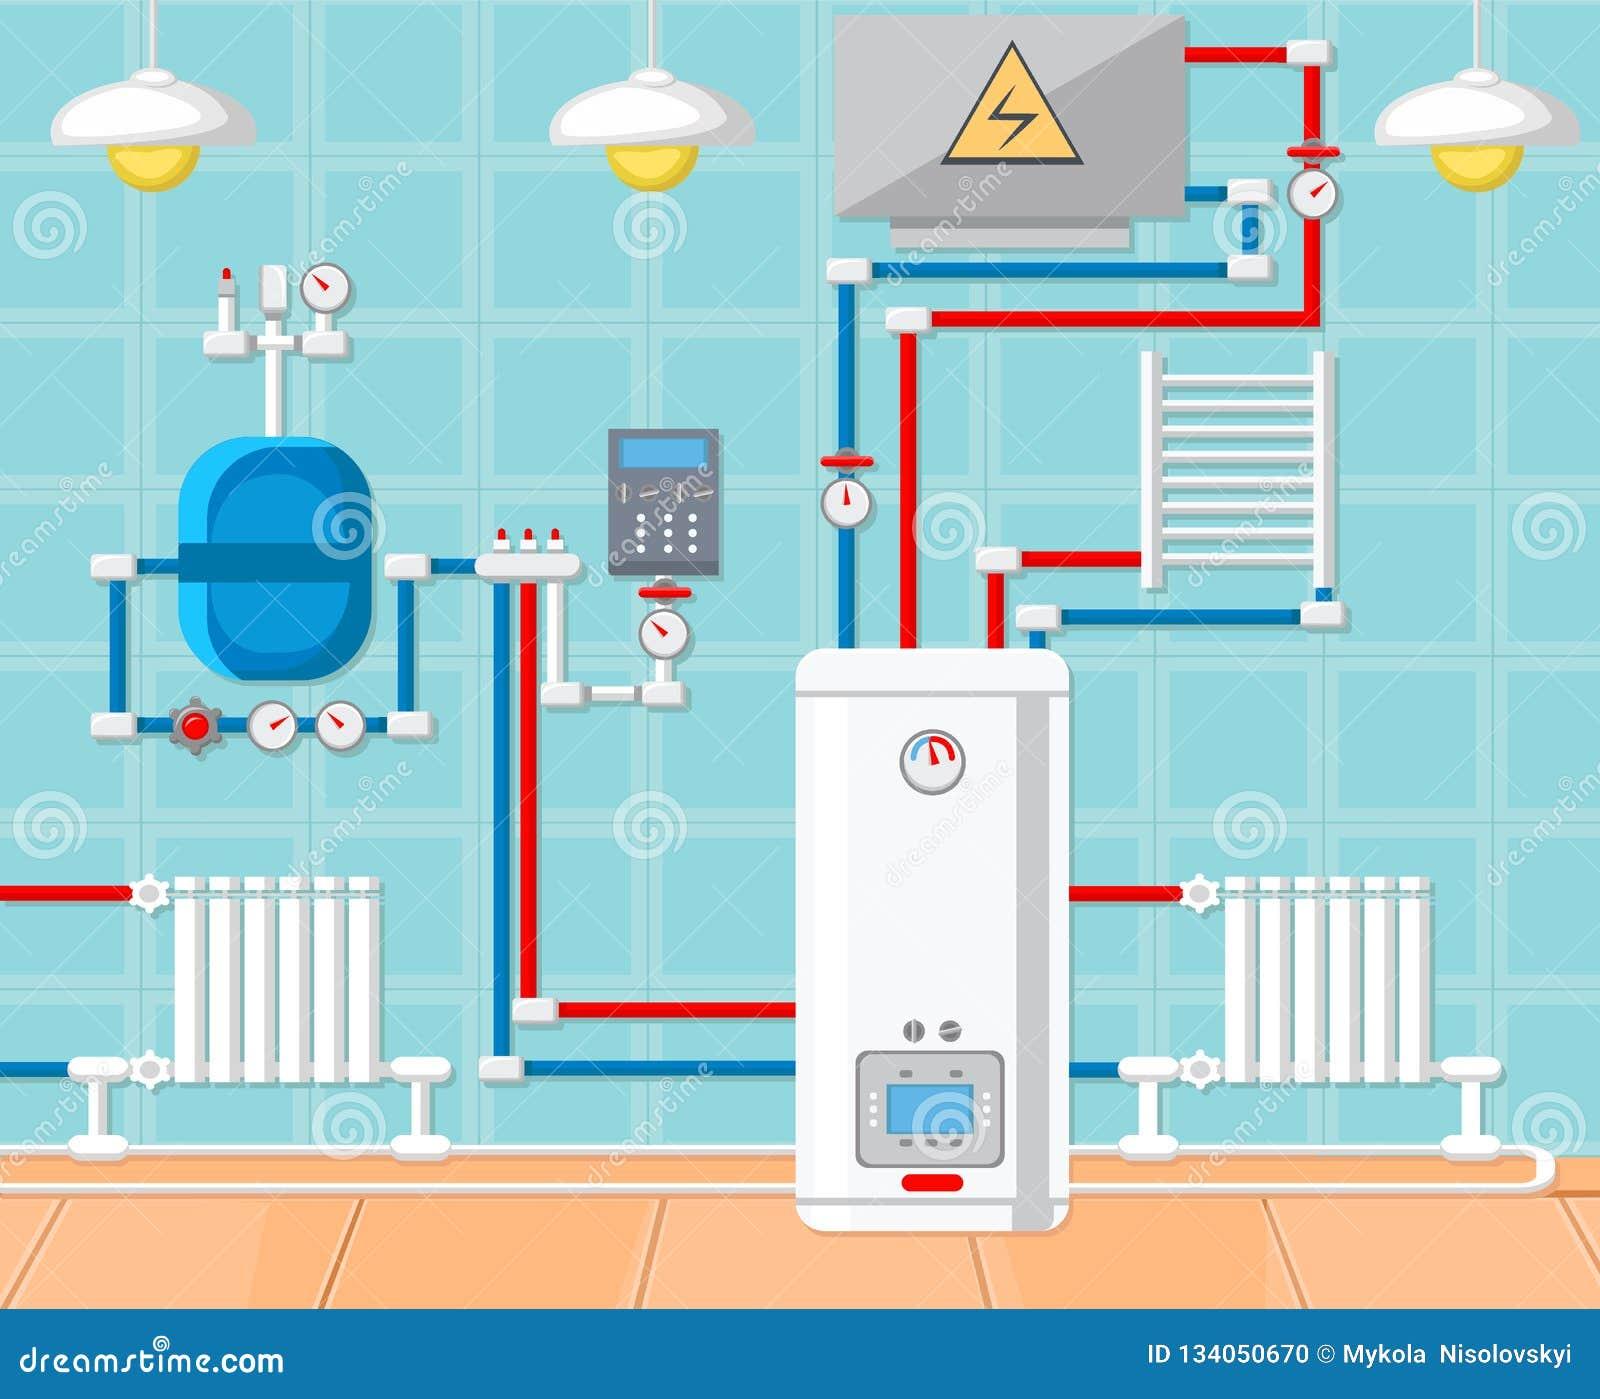 Plumbing In House Concept  Vector Illustration  Stock Vector